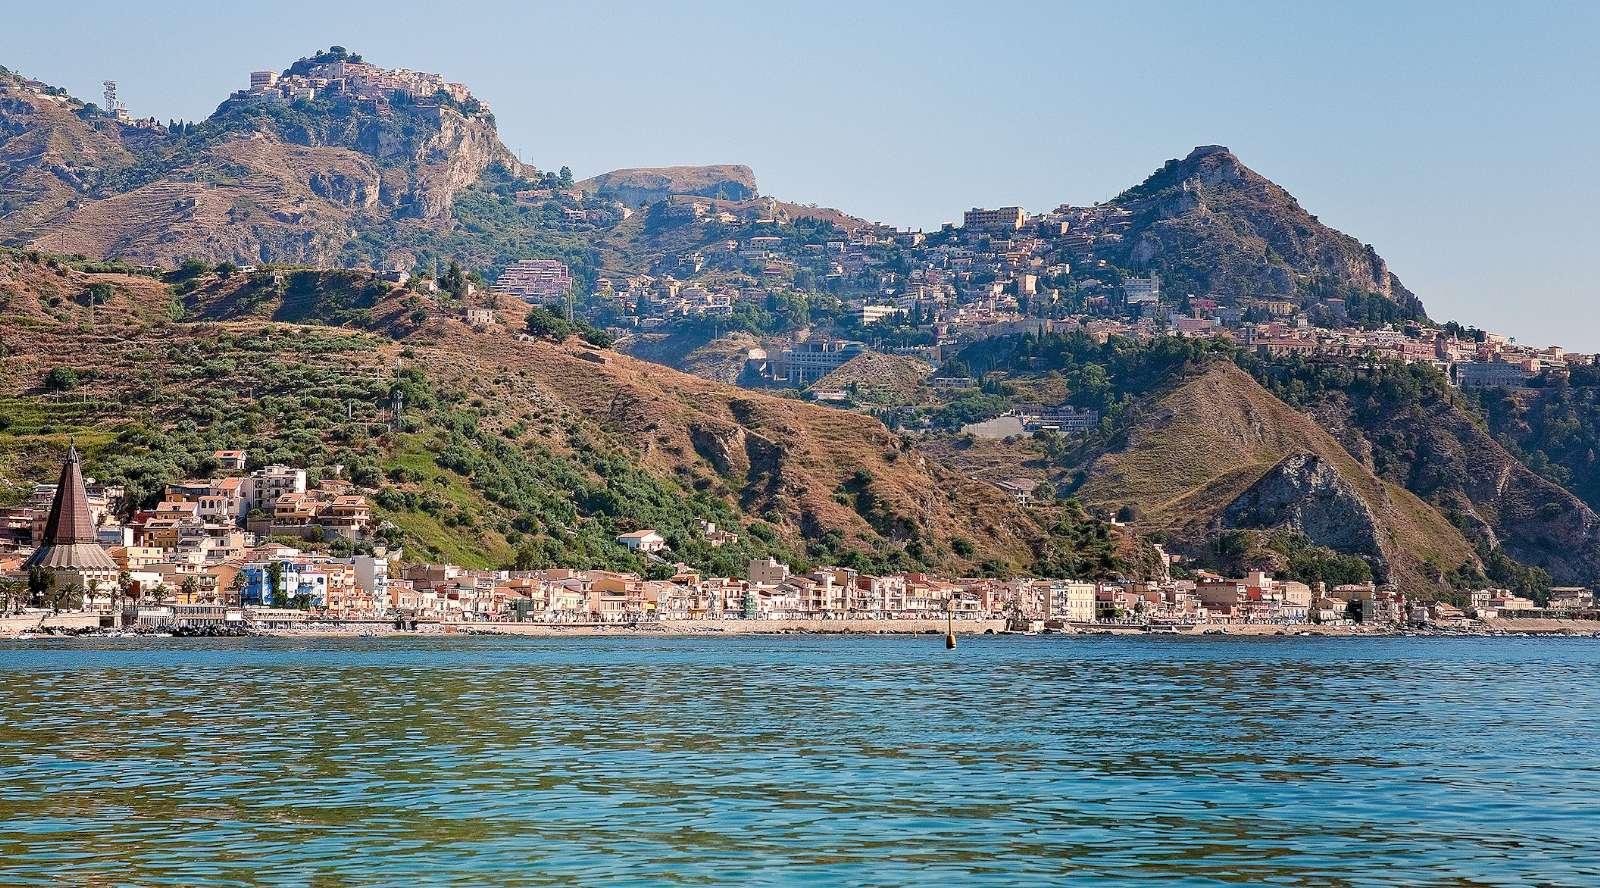 Giardini di Naxos med Taormina och Castelmola i bakgrunden